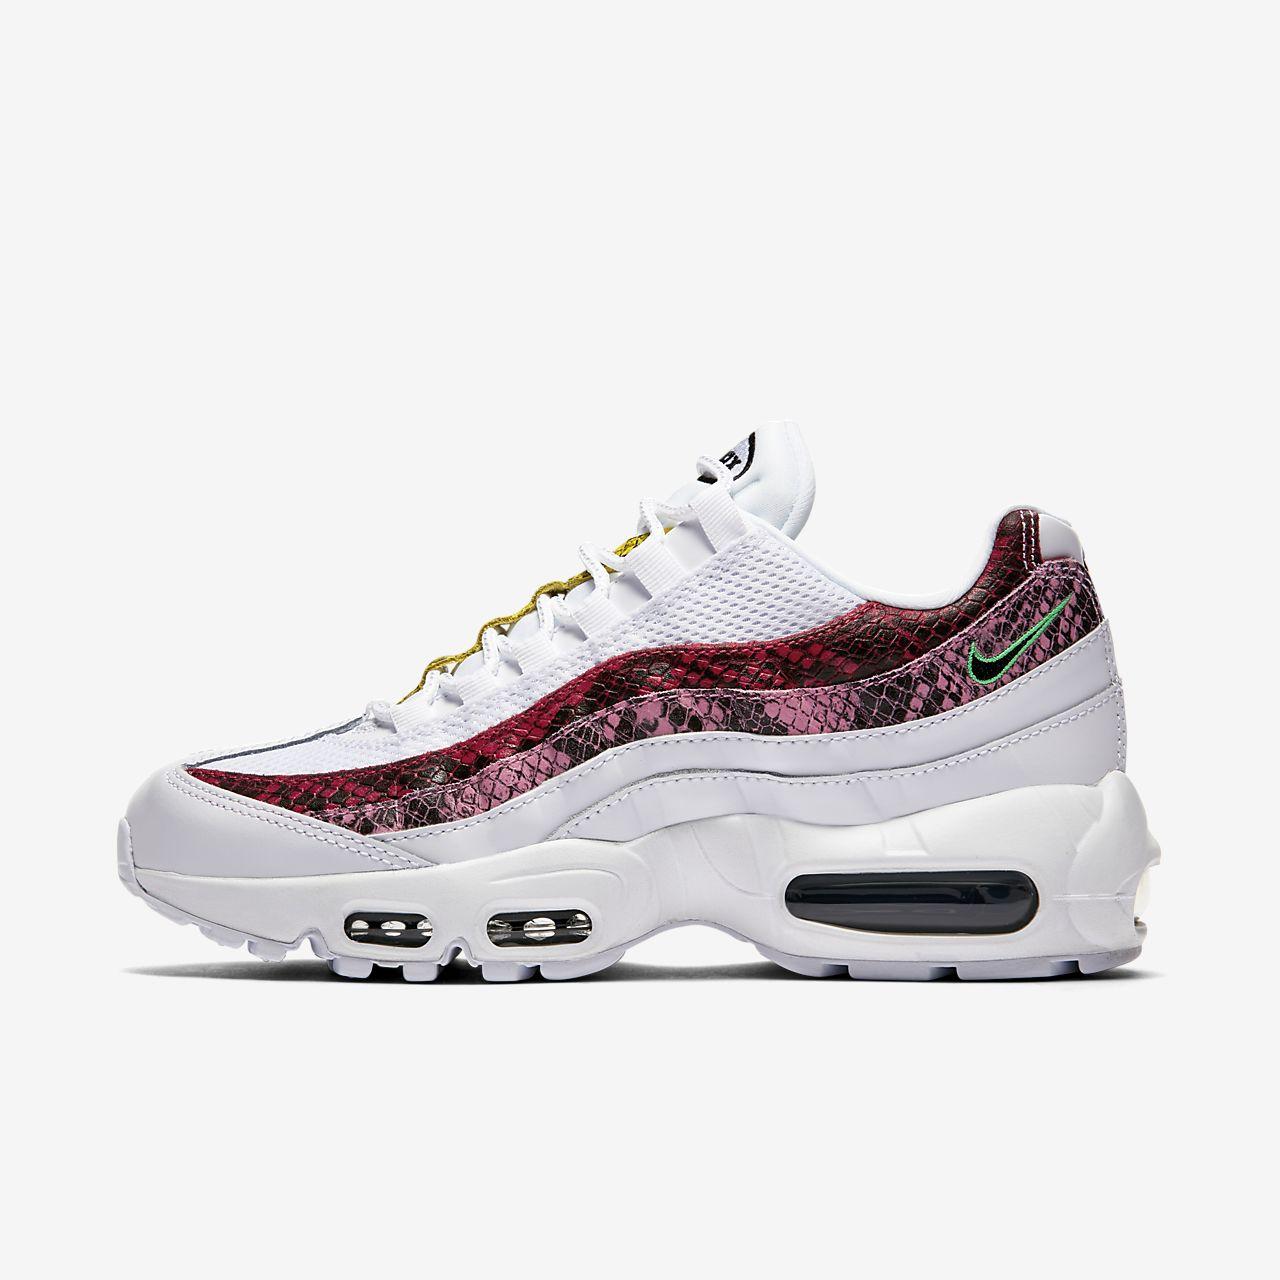 Nike Air Max 95 Premium Animal Women's Shoe